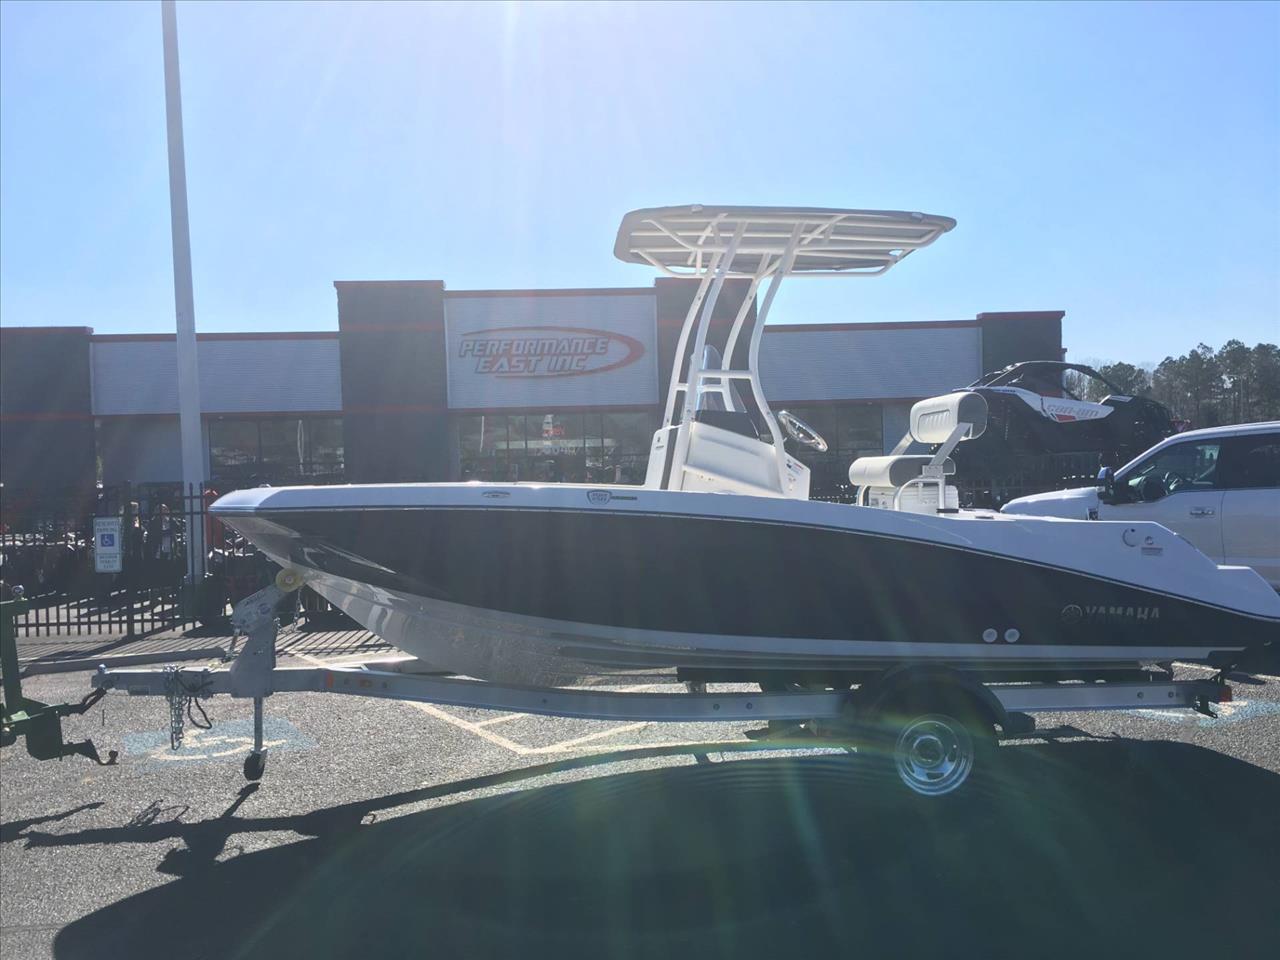 2017 Yamaha 190 FSH Sport for sale at Vehicle Network, LLC - Performance East, INC. in Goldsboro NC